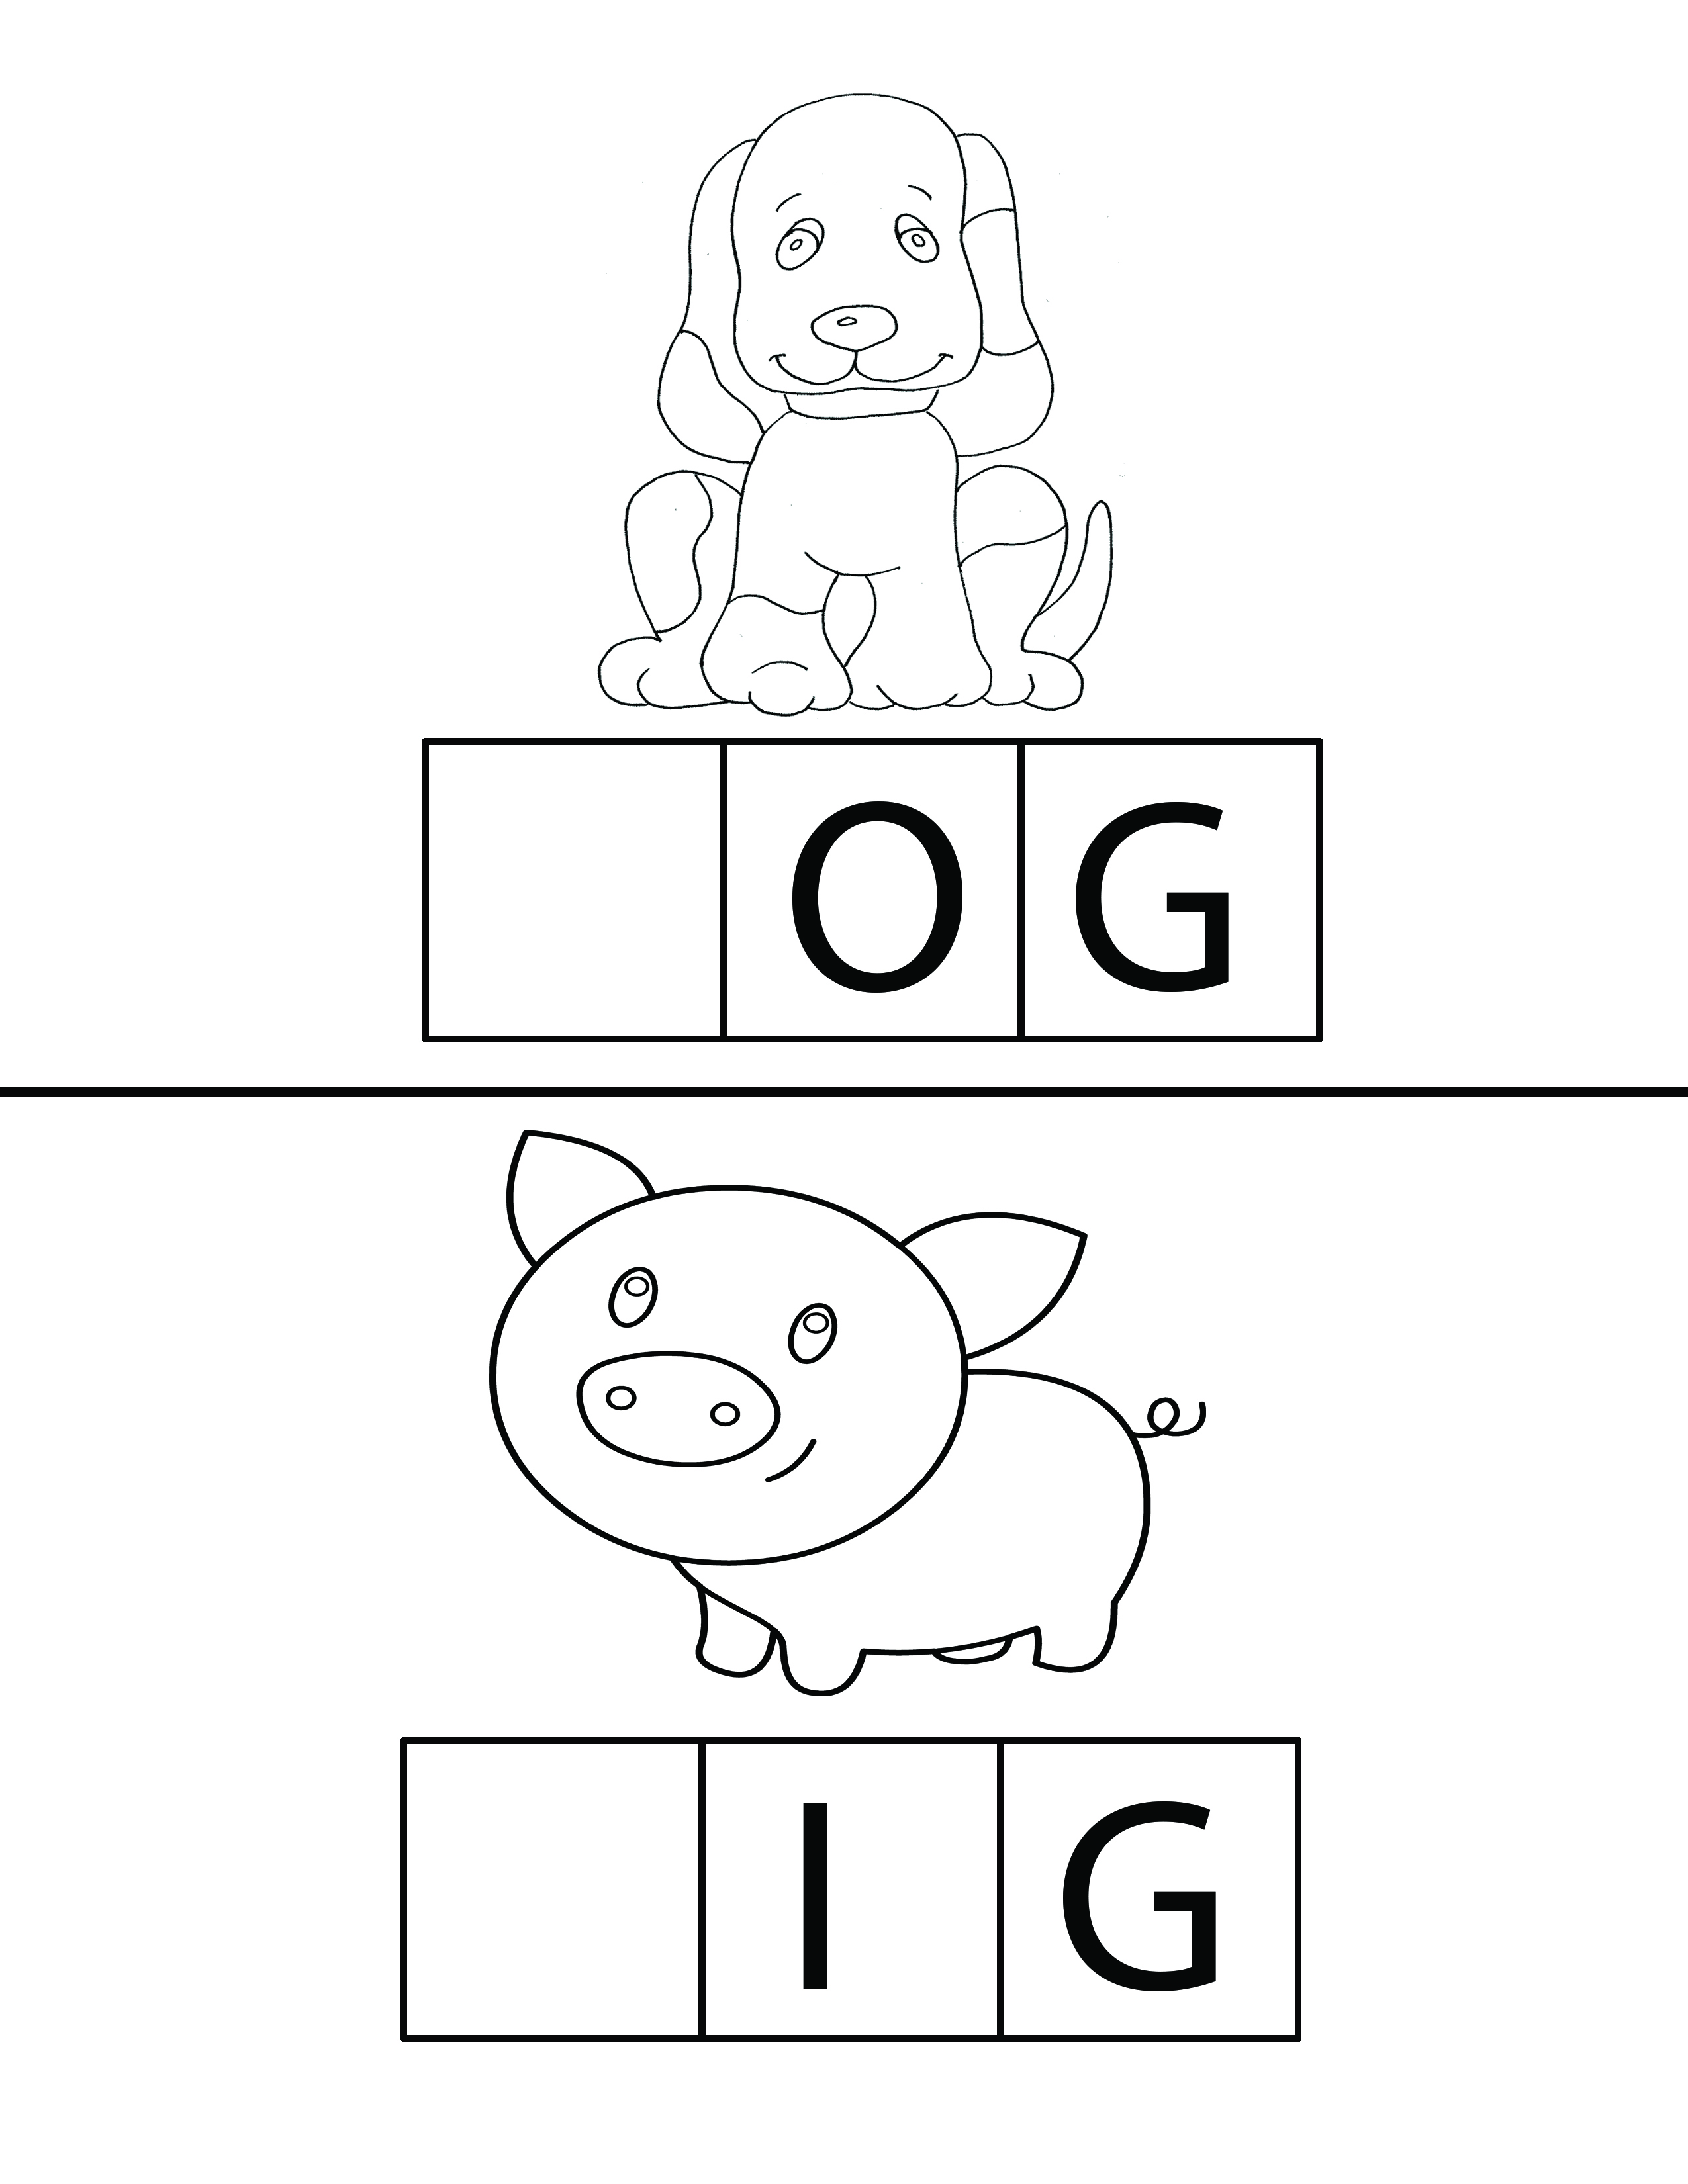 Dog And Pig Spelling Worksheets